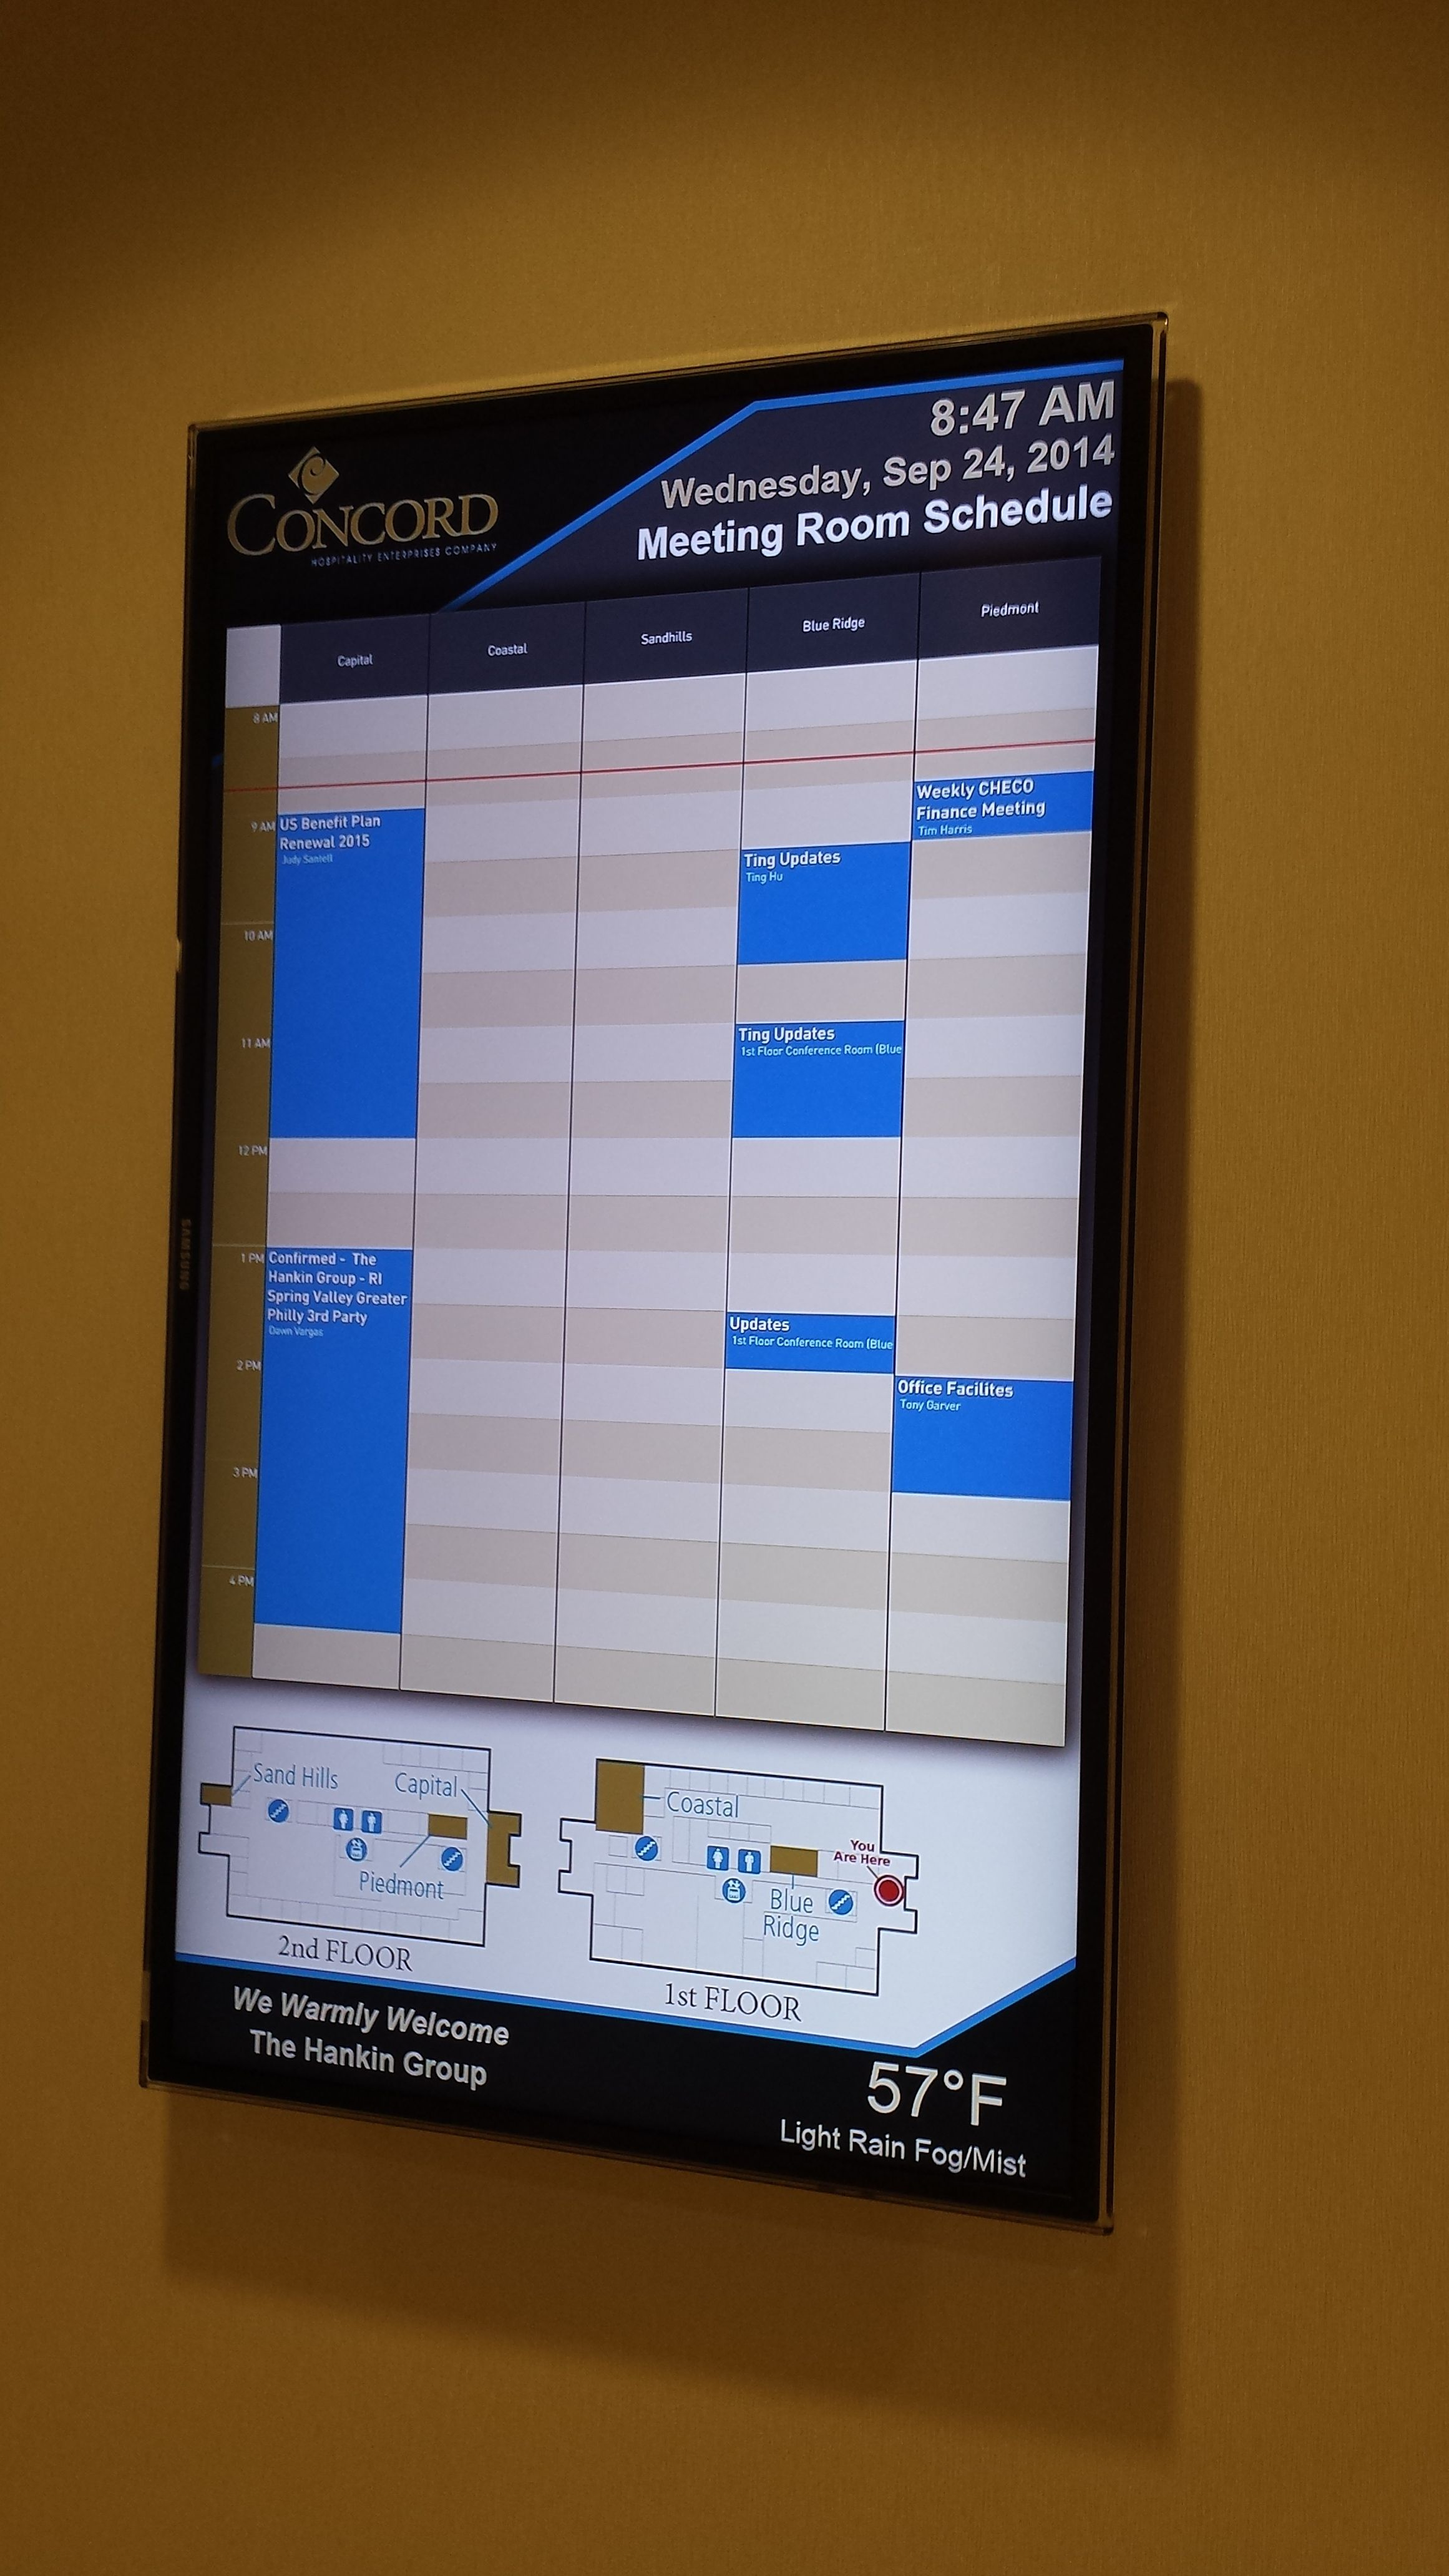 Digital Conference Room Schedule Display